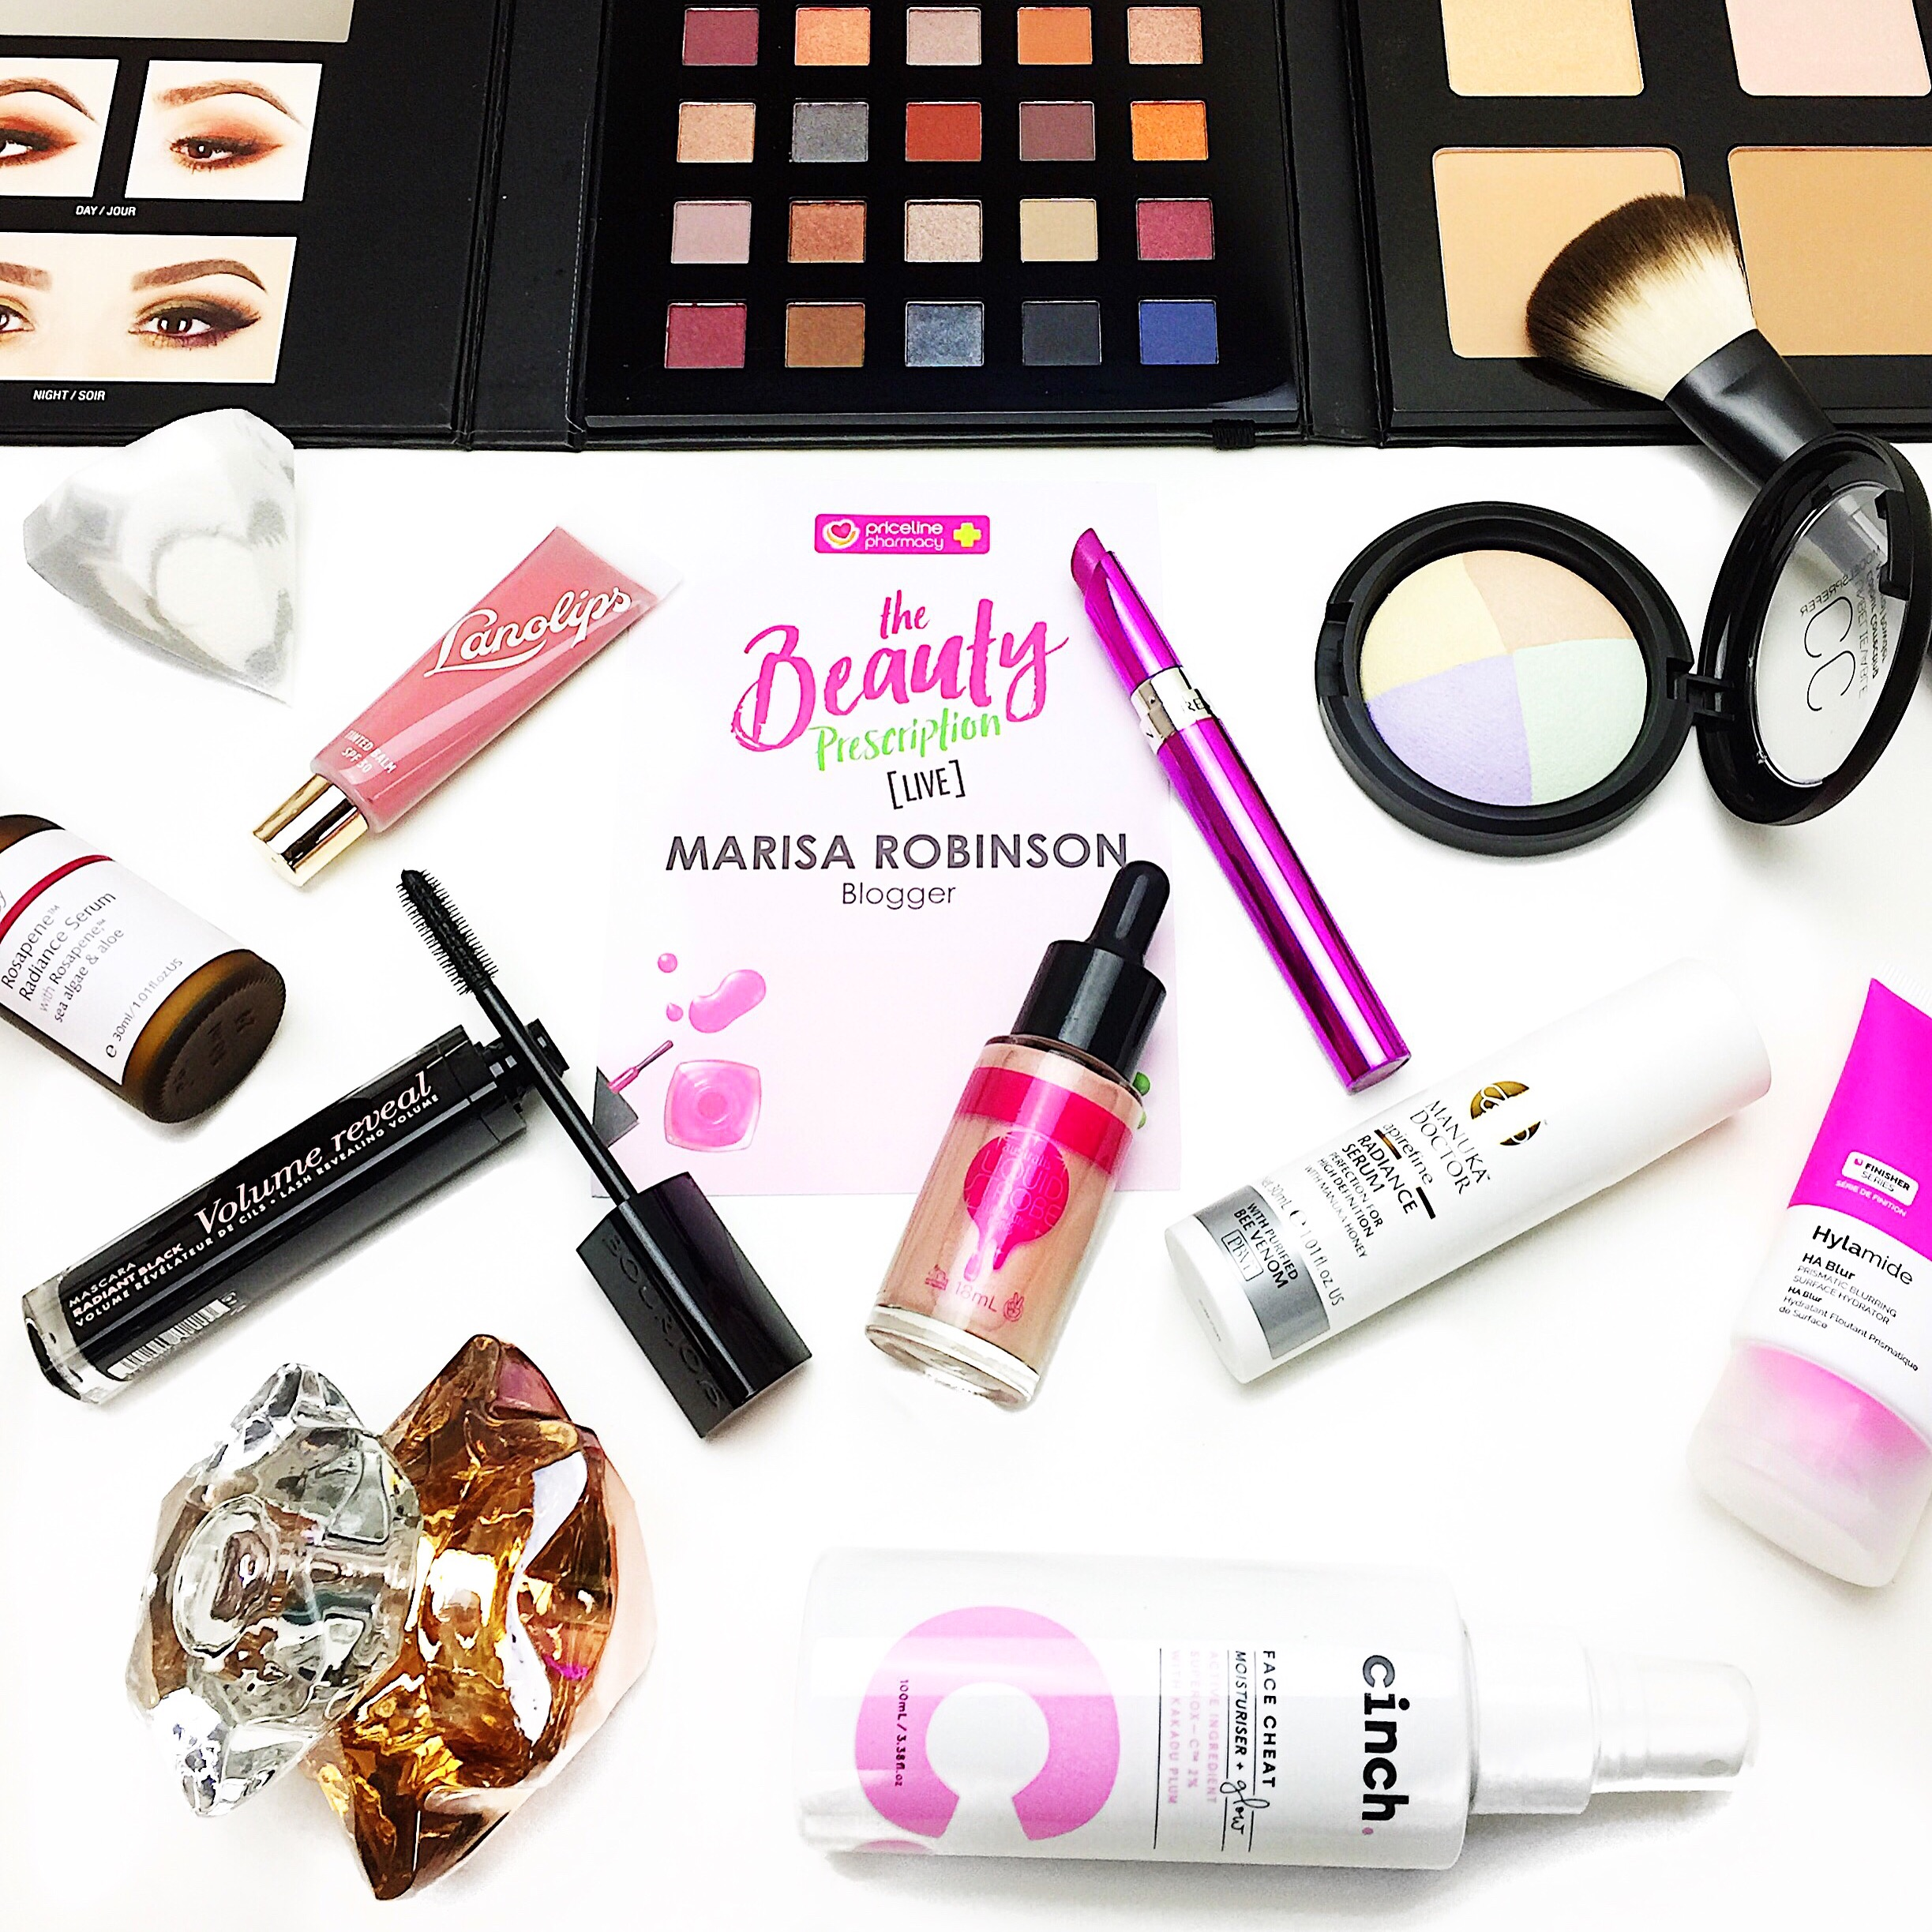 Marisa Robinson Beauty Blogger Priceline: The Beauty Prescription Event 2017 Priceline Beauty Prescription Live 2017